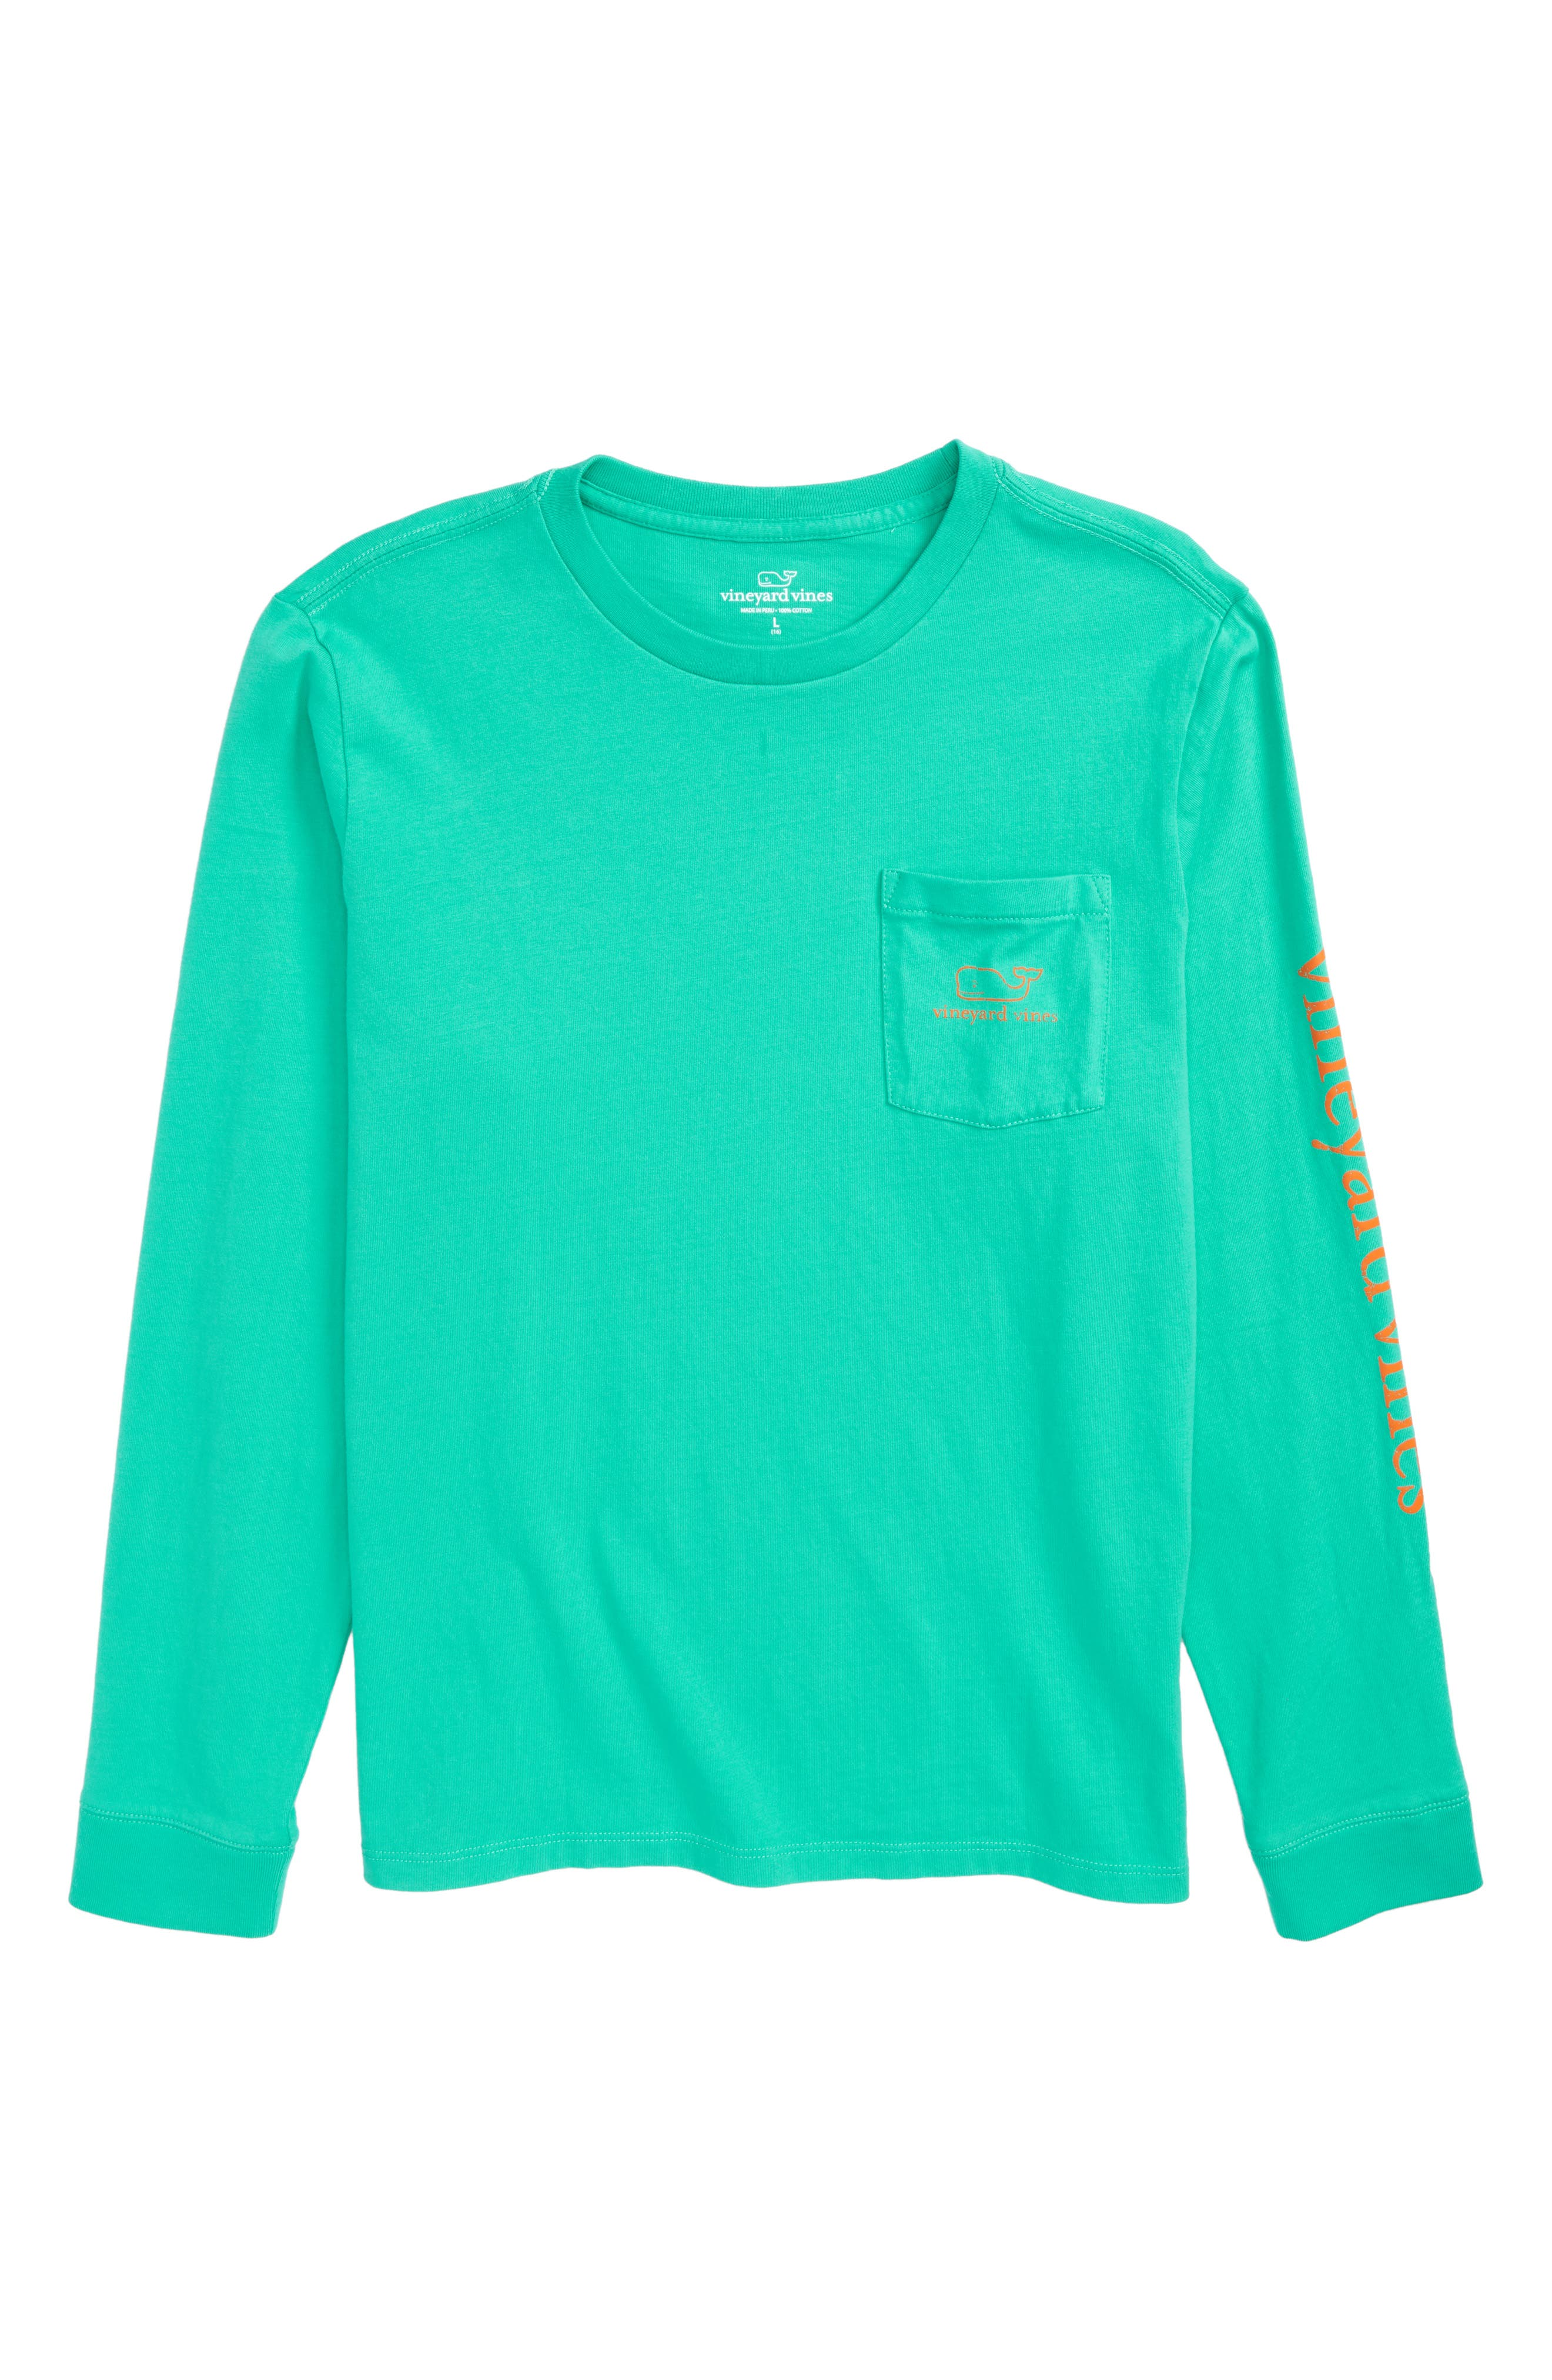 Vintage Whale Graphic Long Sleeve T-Shirt,                             Main thumbnail 1, color,                             386